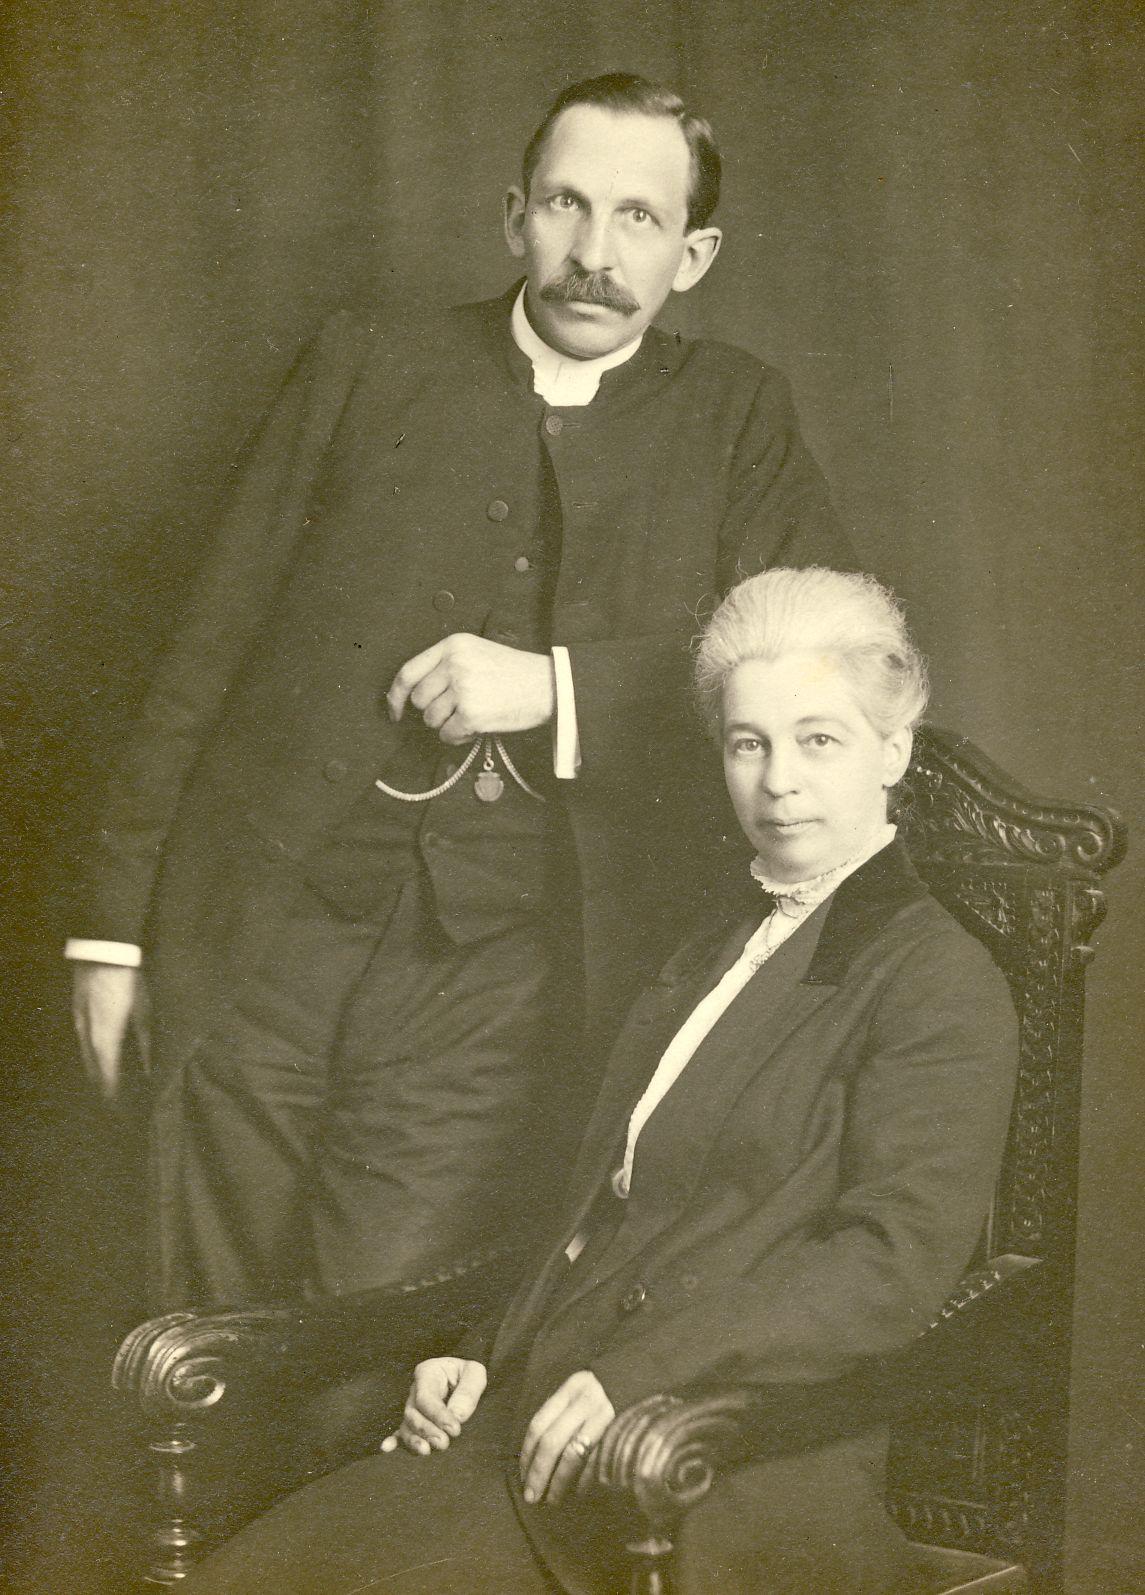 Gerrit and Mina du Plessis